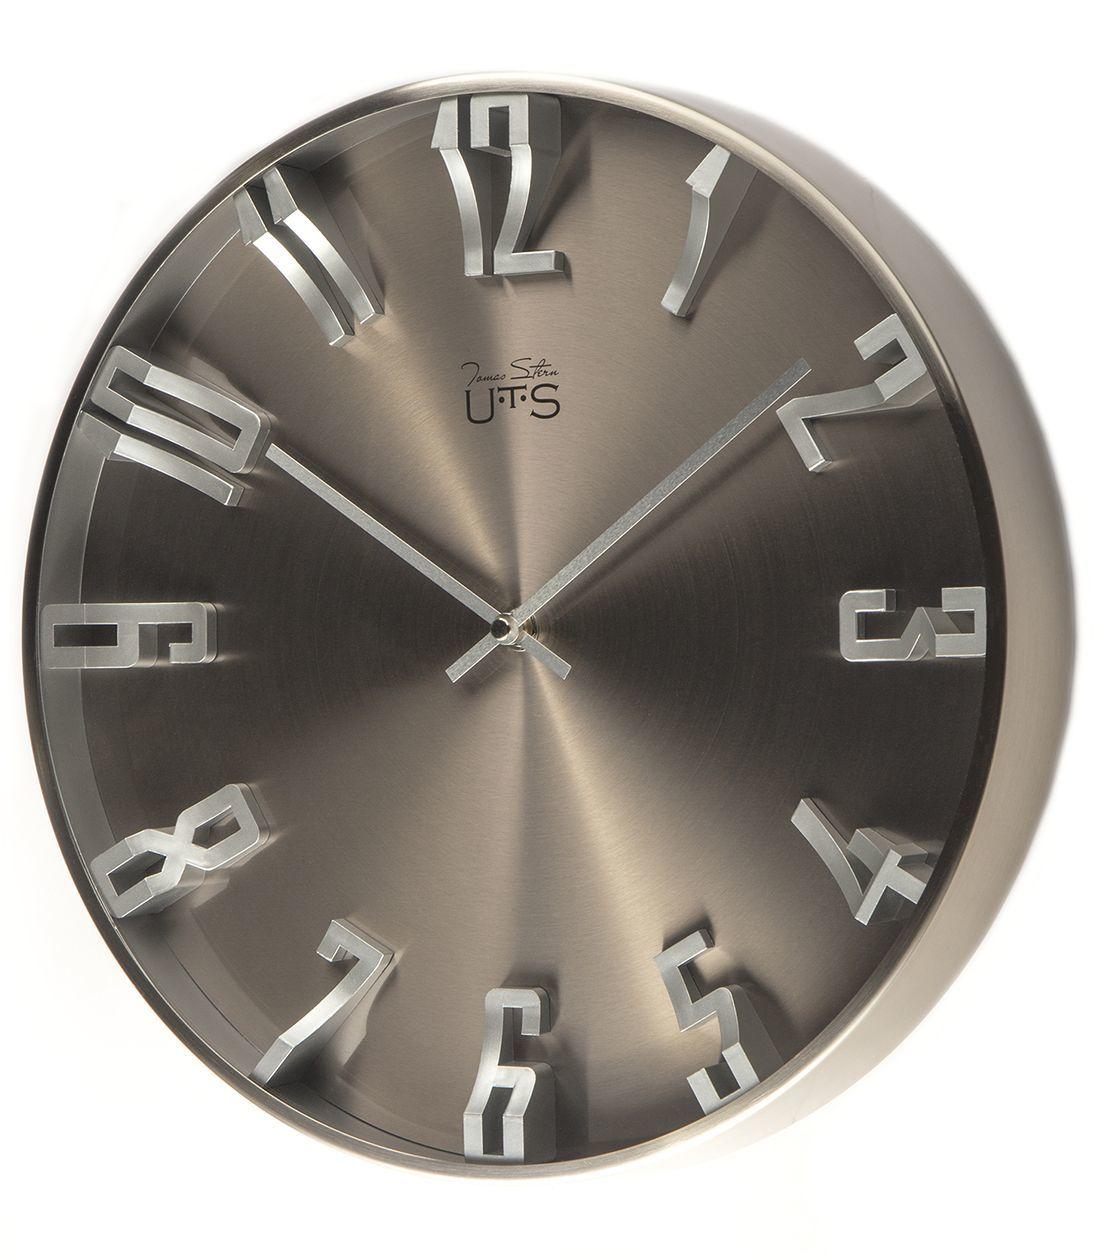 Часы настенные Часы настенные Tomas Stern 9014 chasy-nastennye-tomas-stern-9014-germaniya.jpg